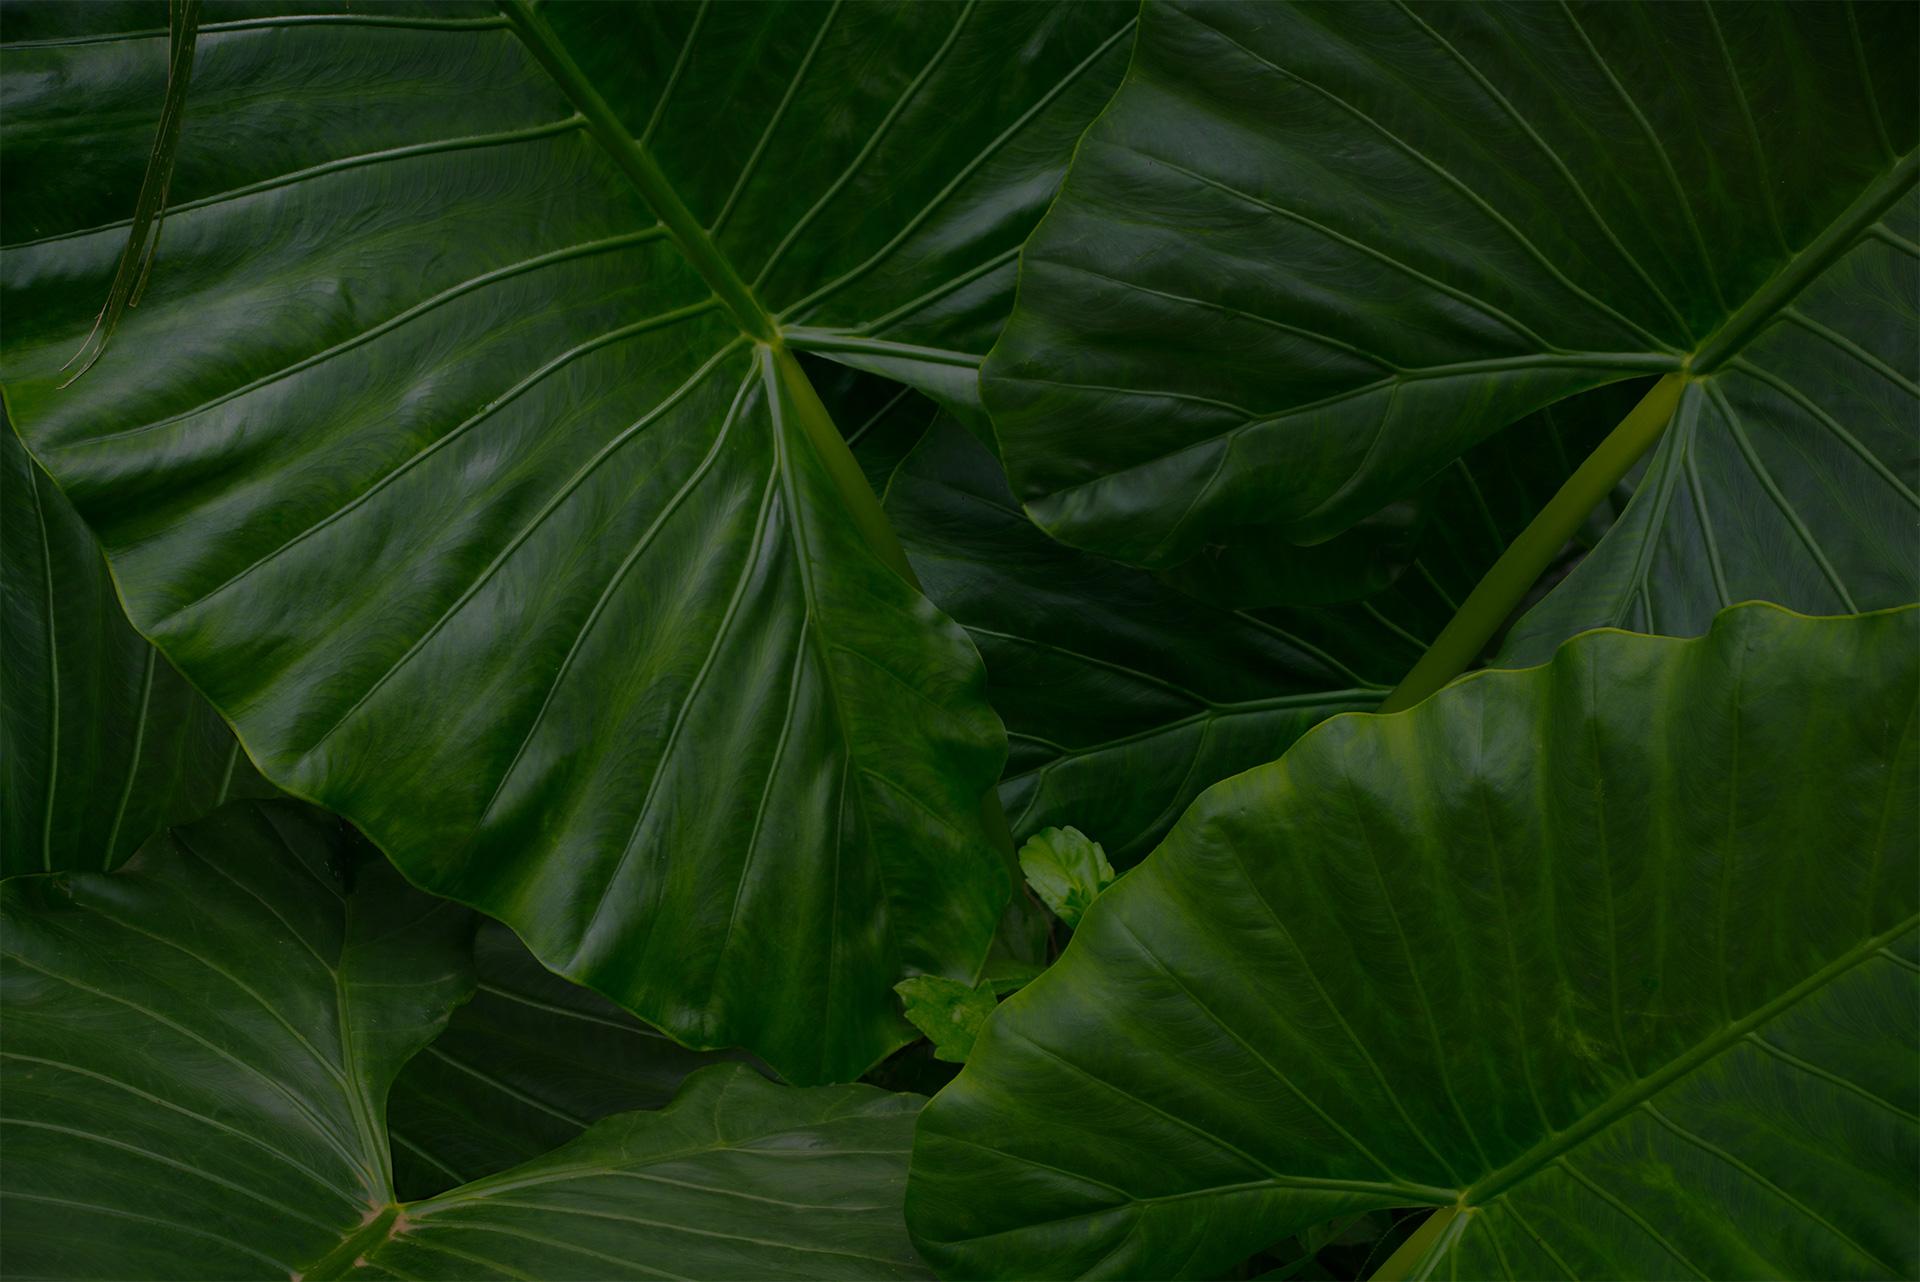 jungle-leaves-GGLZ8NY